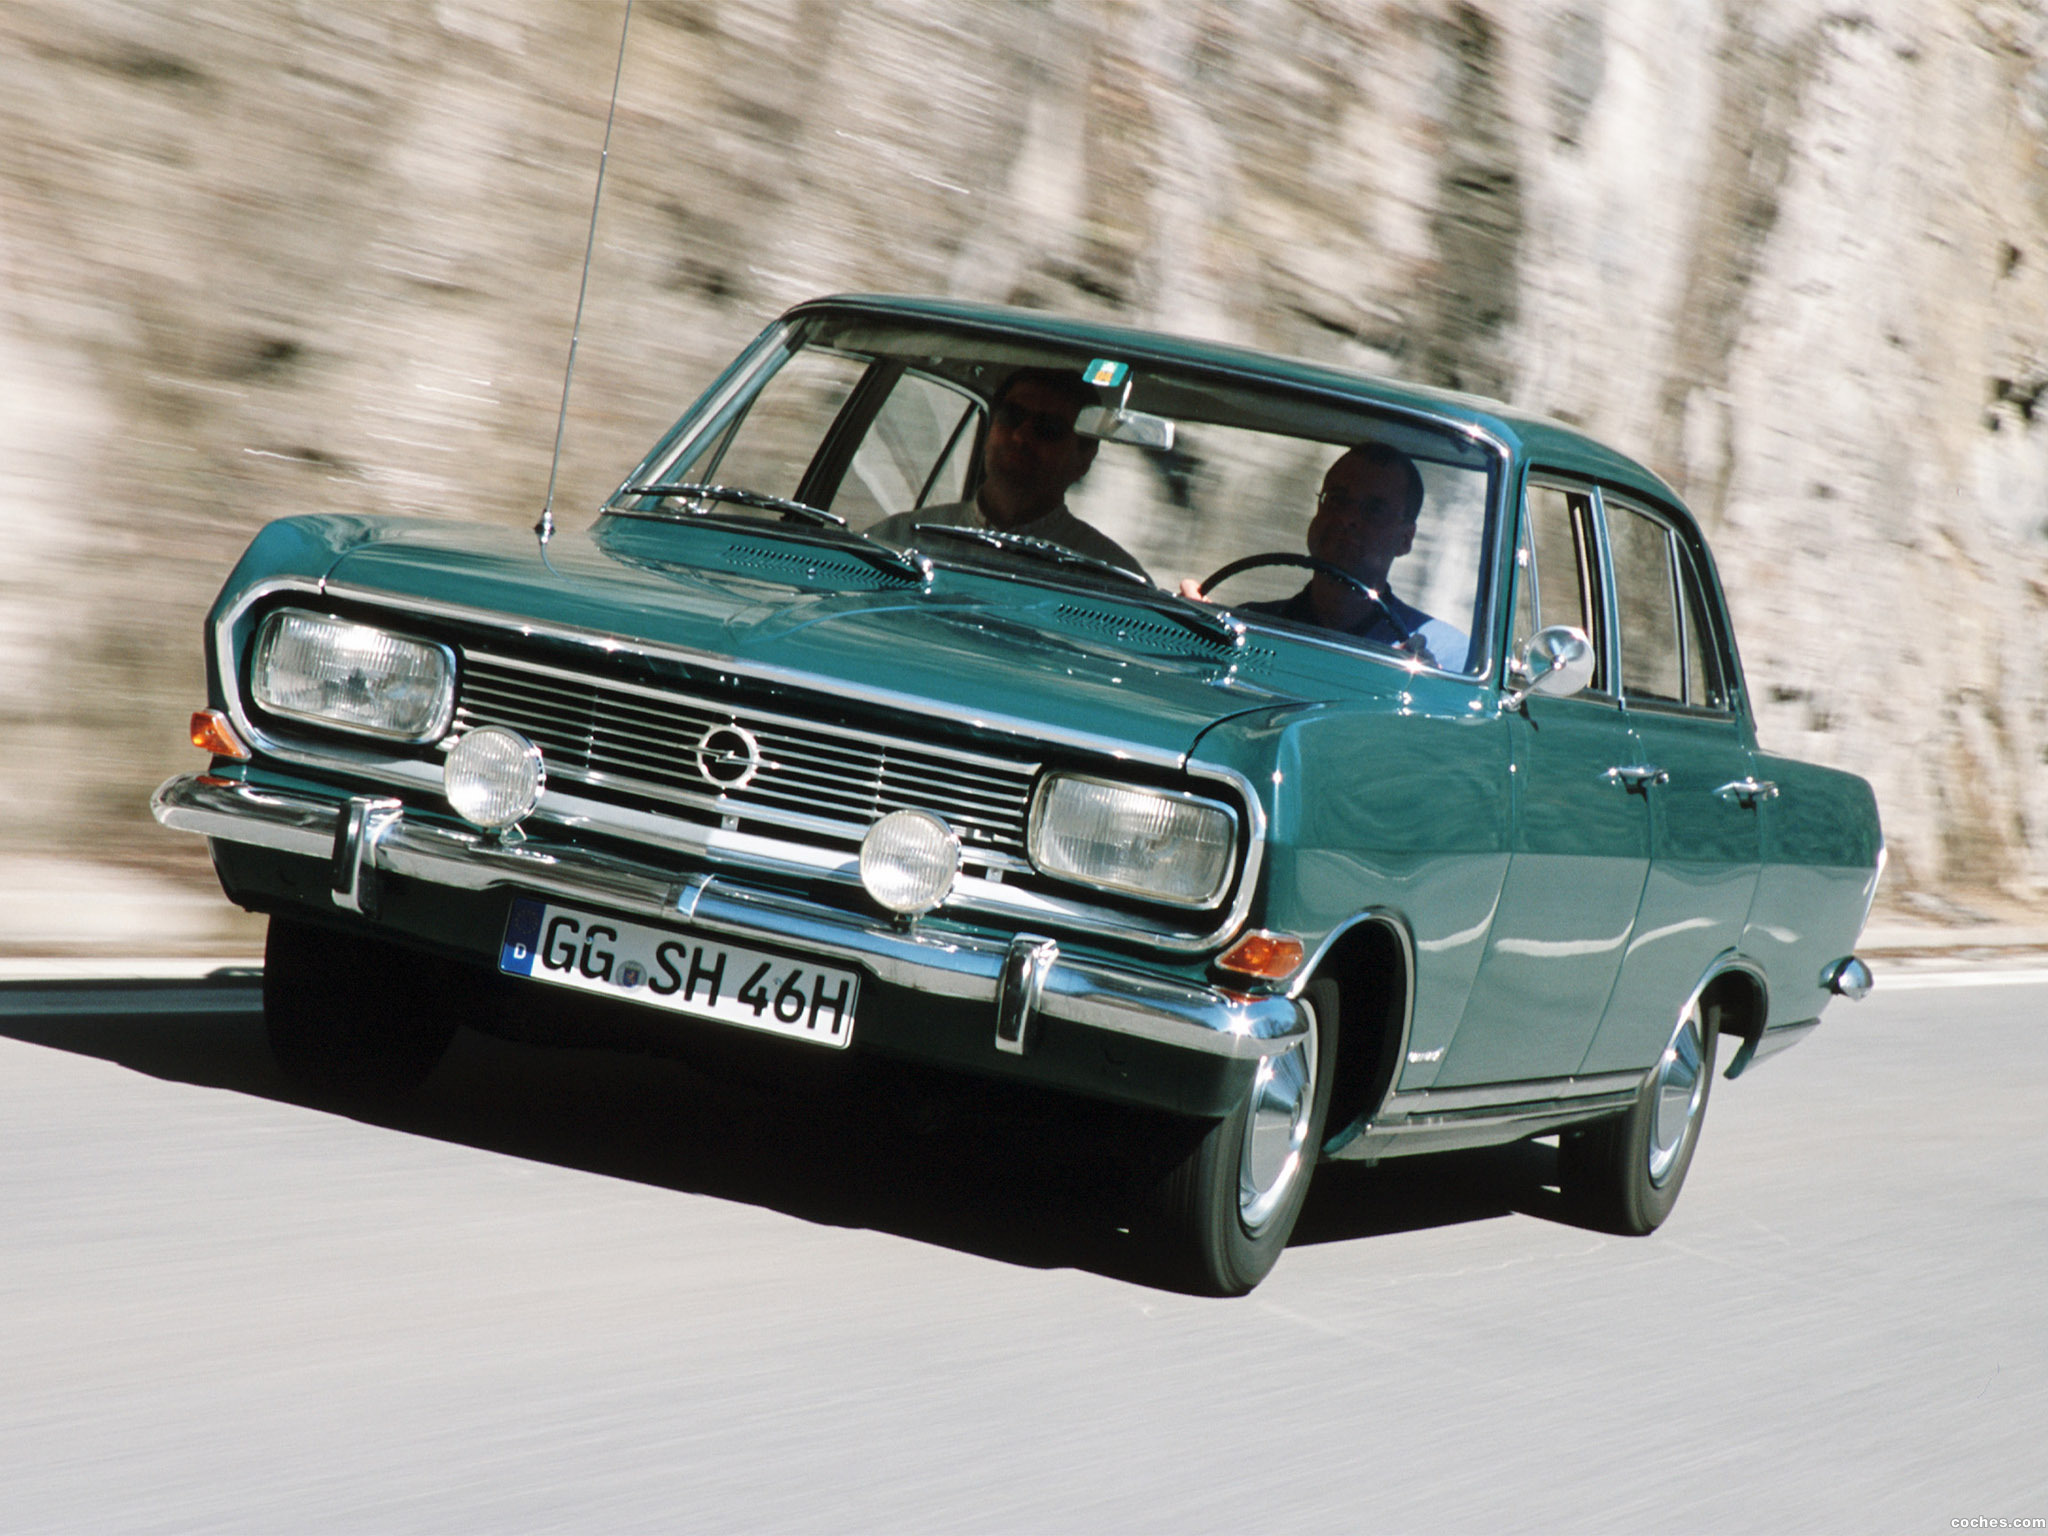 Foto 0 de Opel Rekord B Luxus 1965